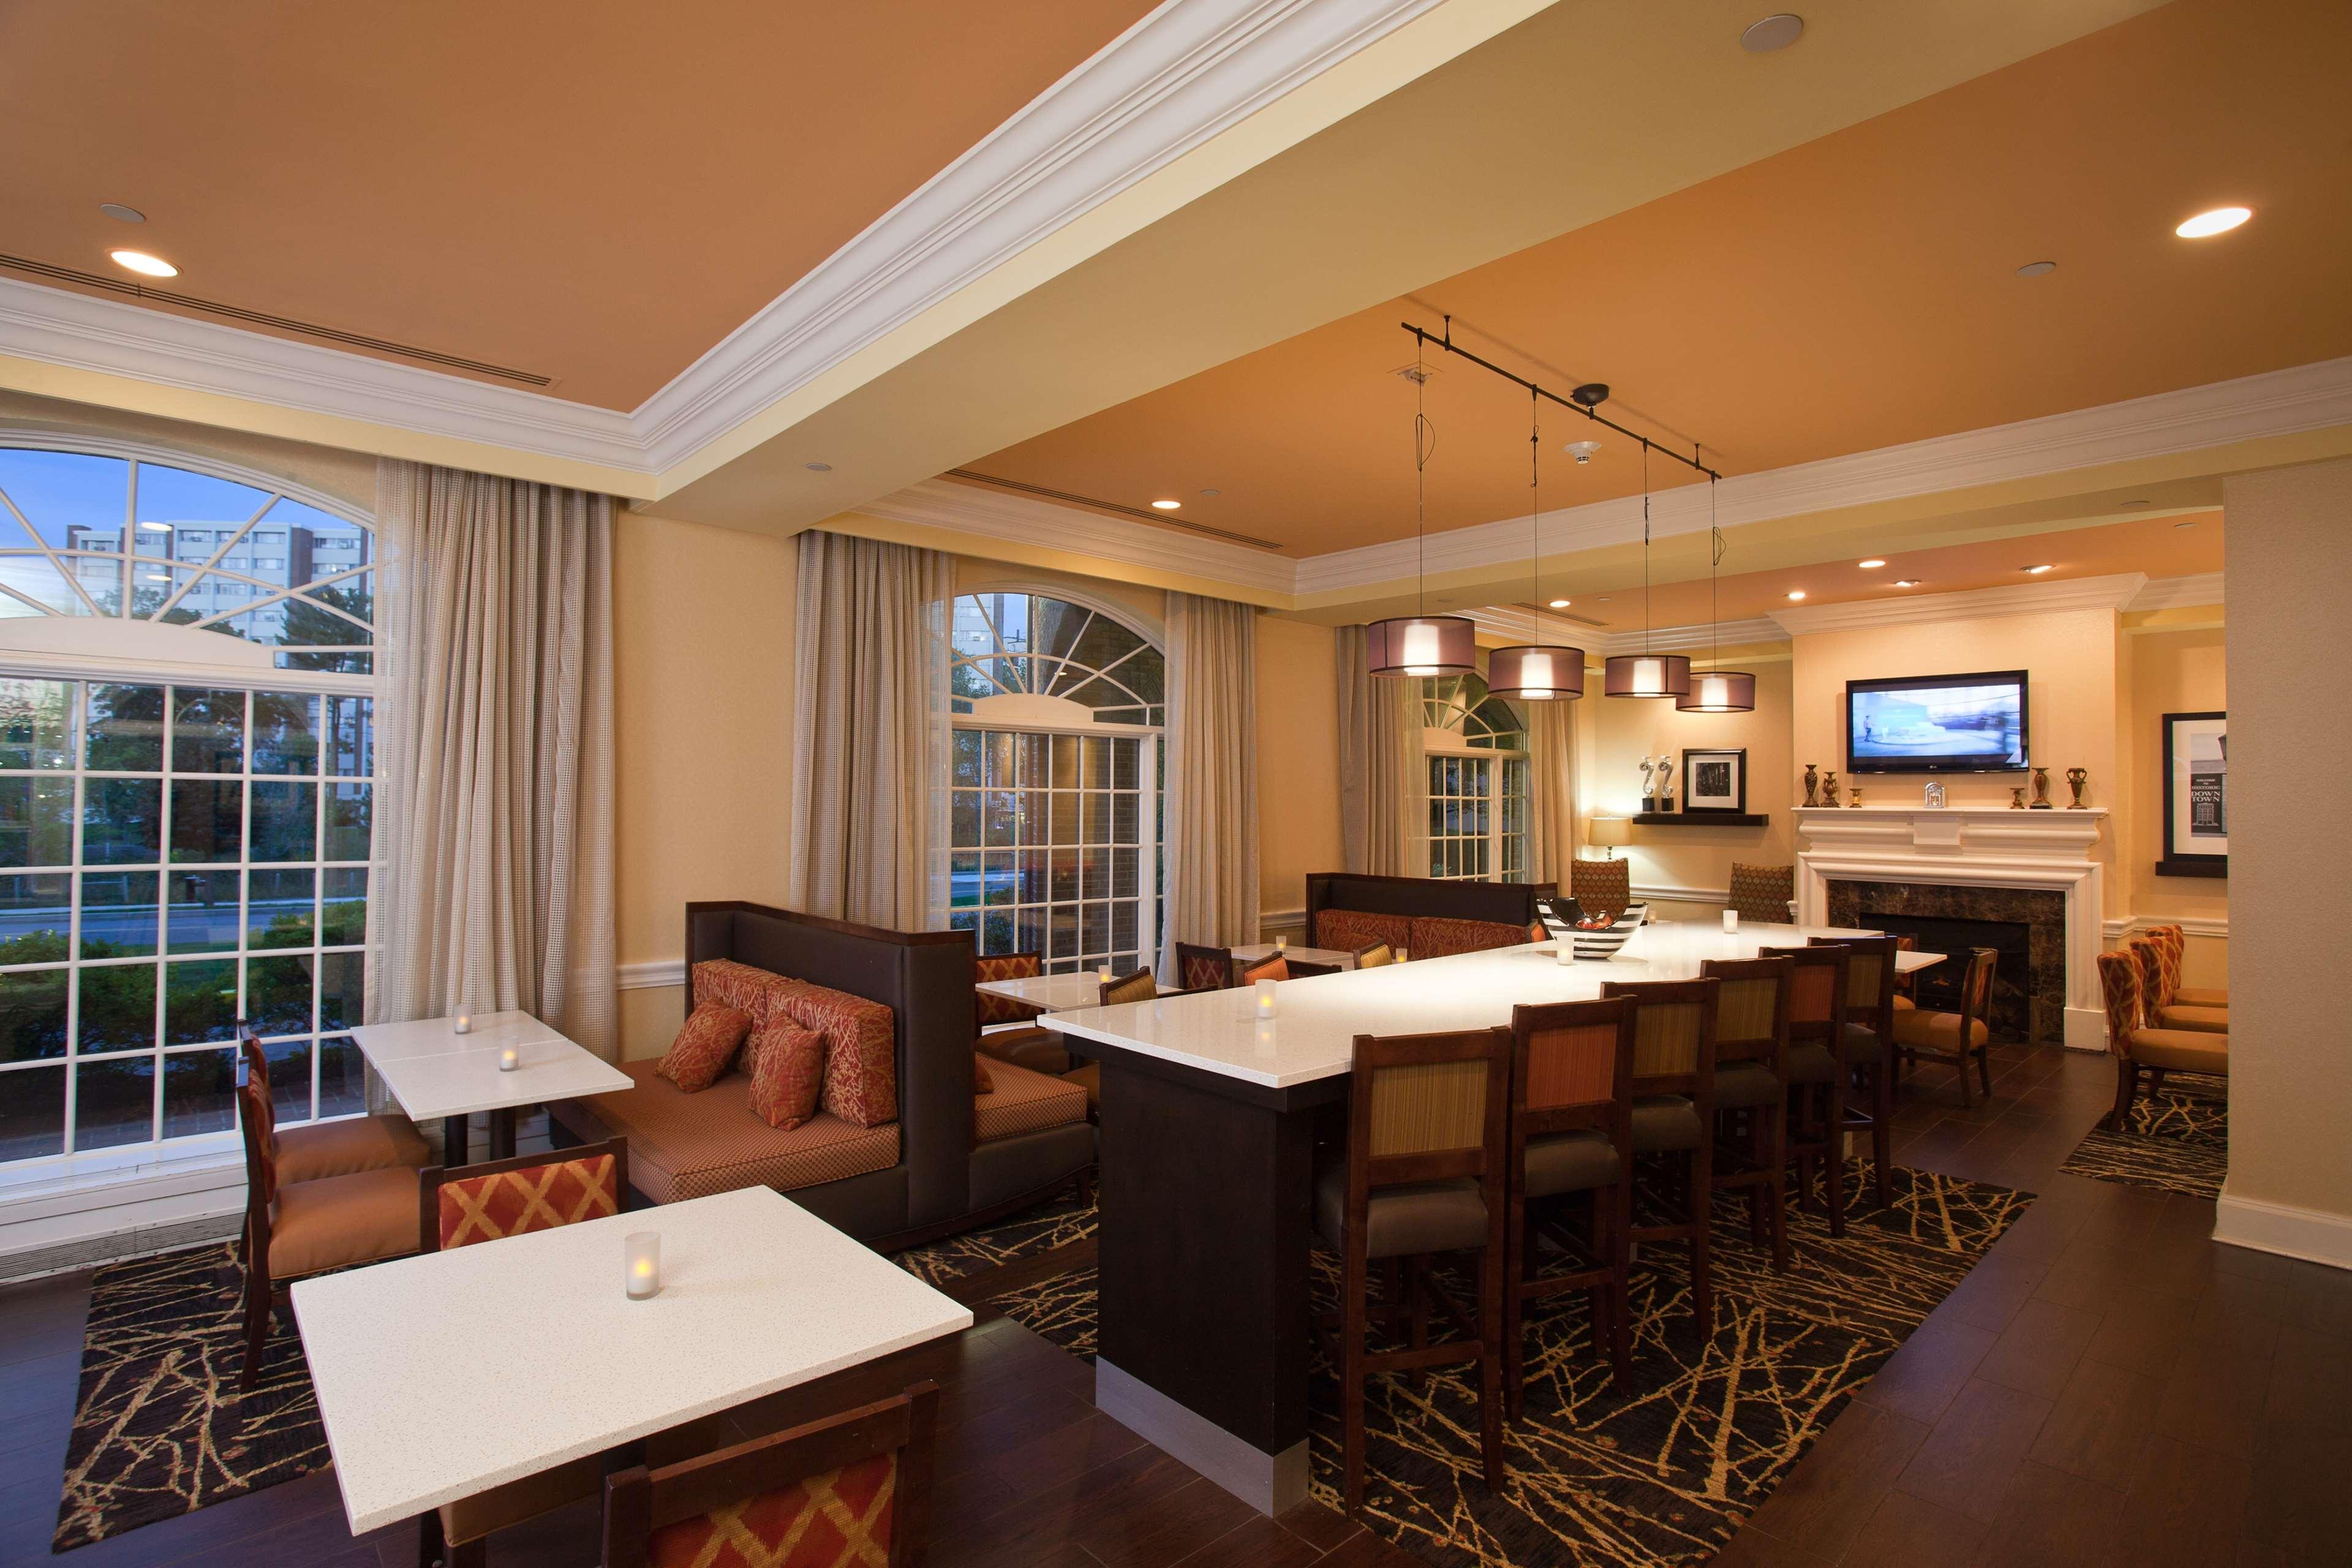 Hampton Inn & Suites Stamford image 12